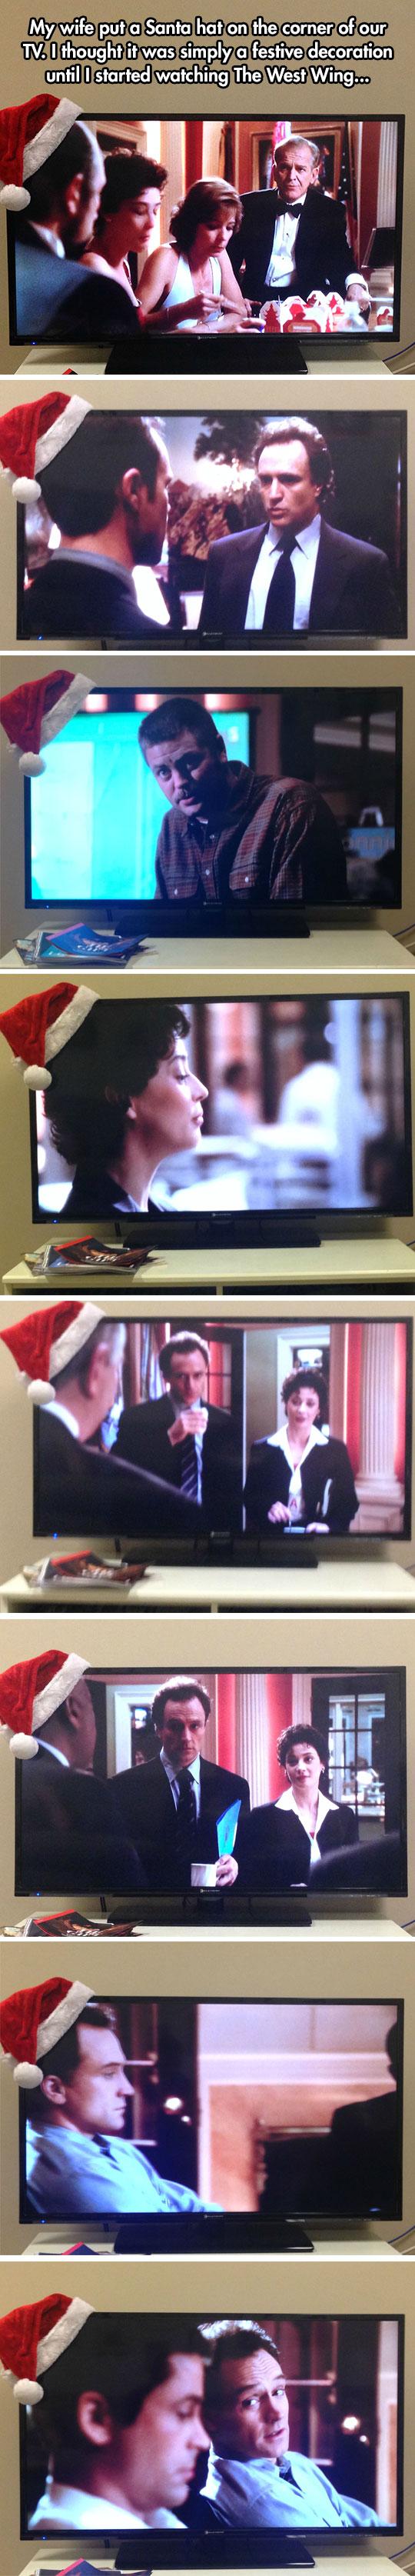 funny-Santa-hat-TV-West-Wing